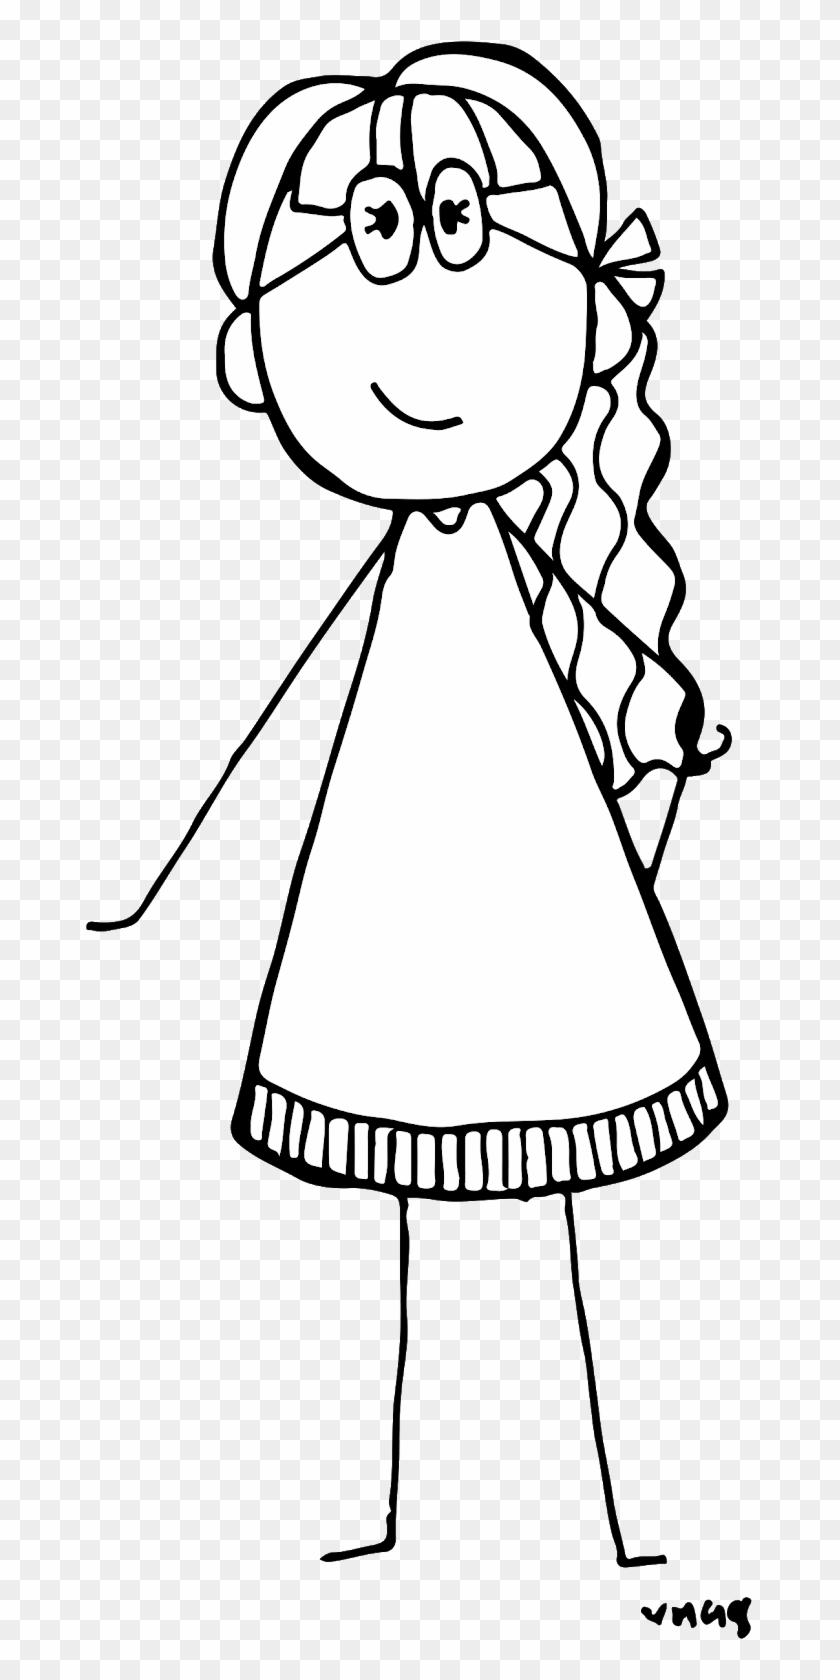 Activity Days For Girls Clip Art - Melonheadz Lds Illustrating Blogspot #1355415